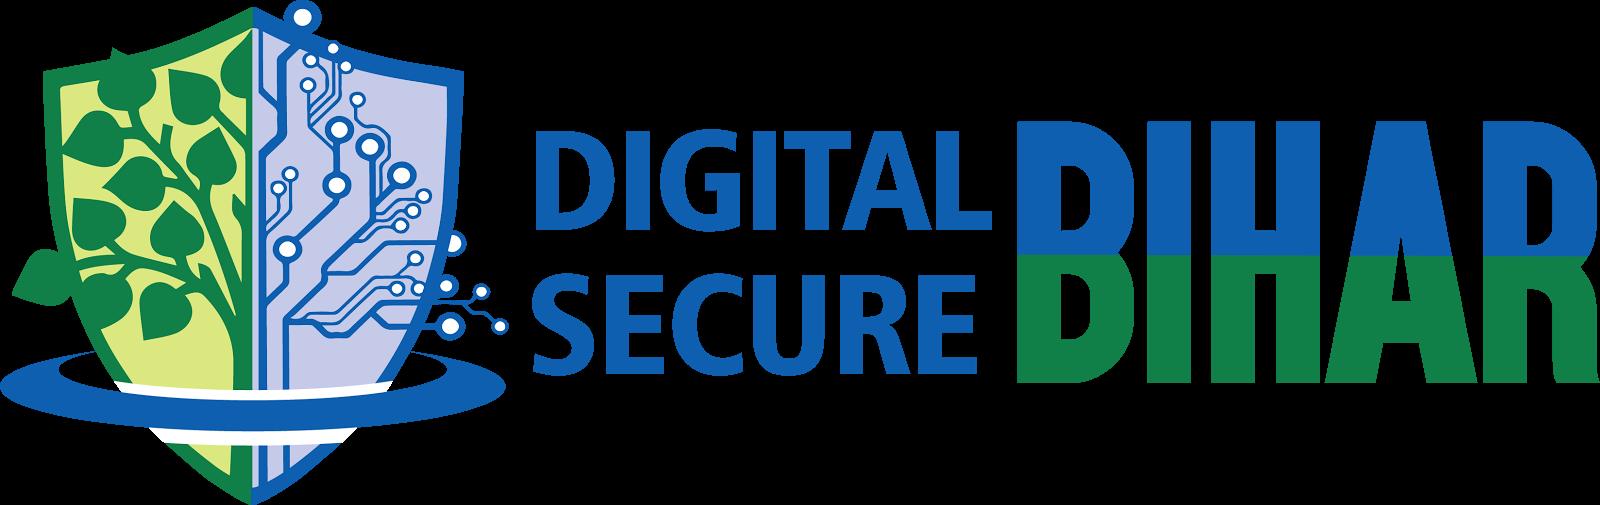 Digital Bihar Secure Bihar